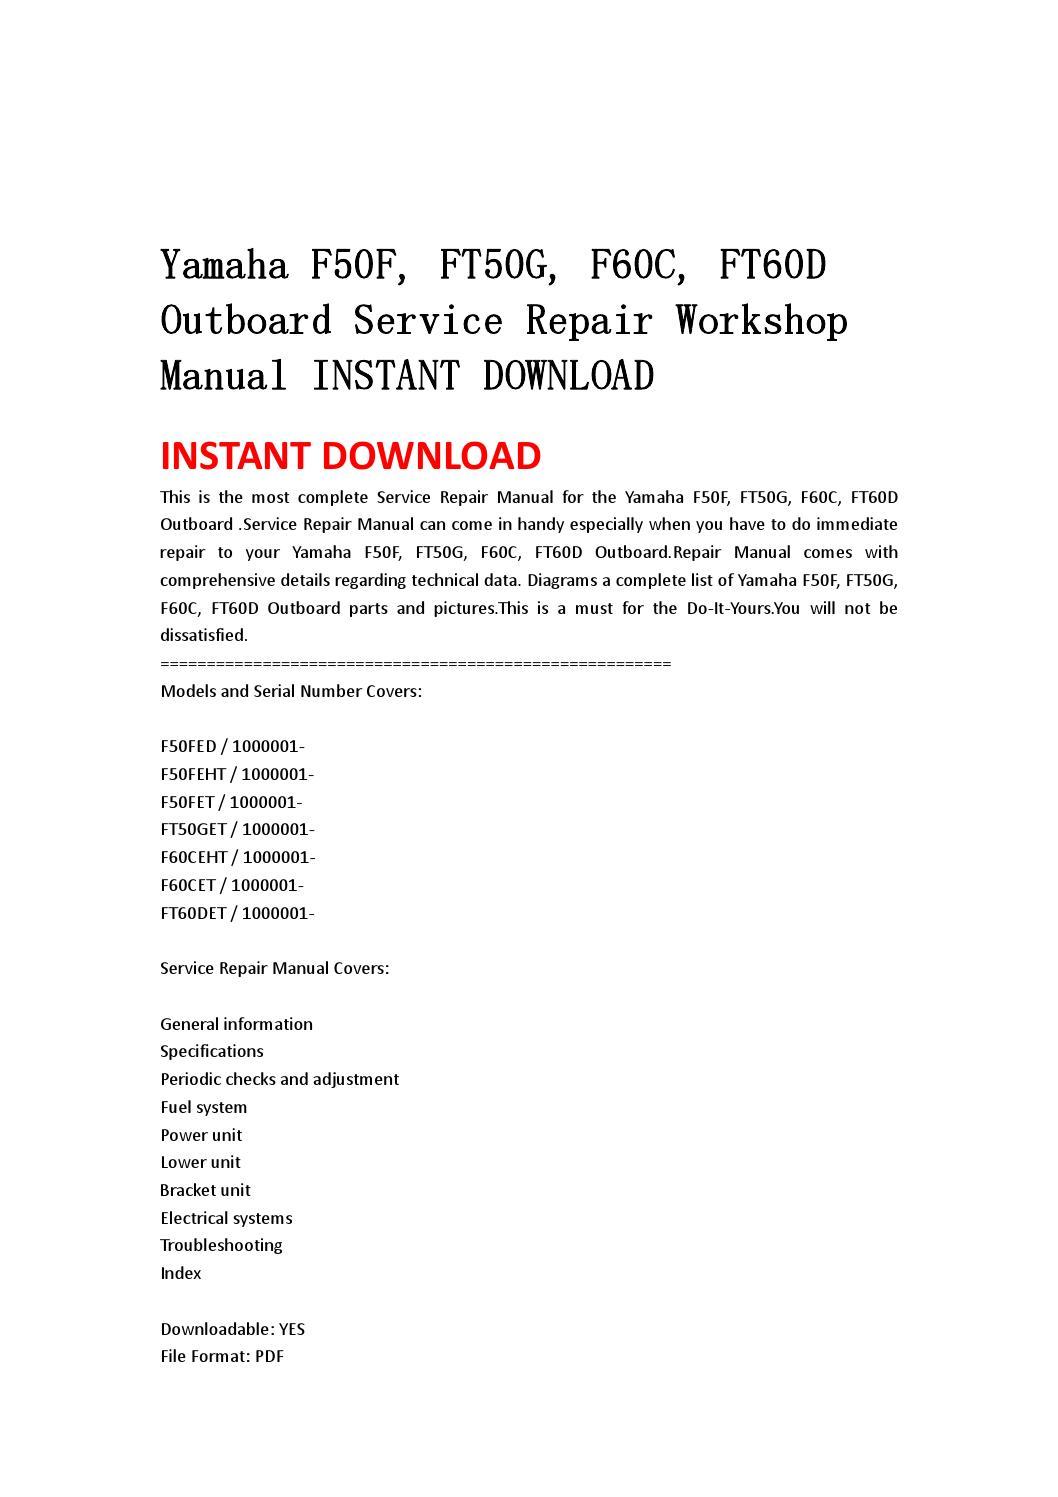 Adobe reader for mac catalina update